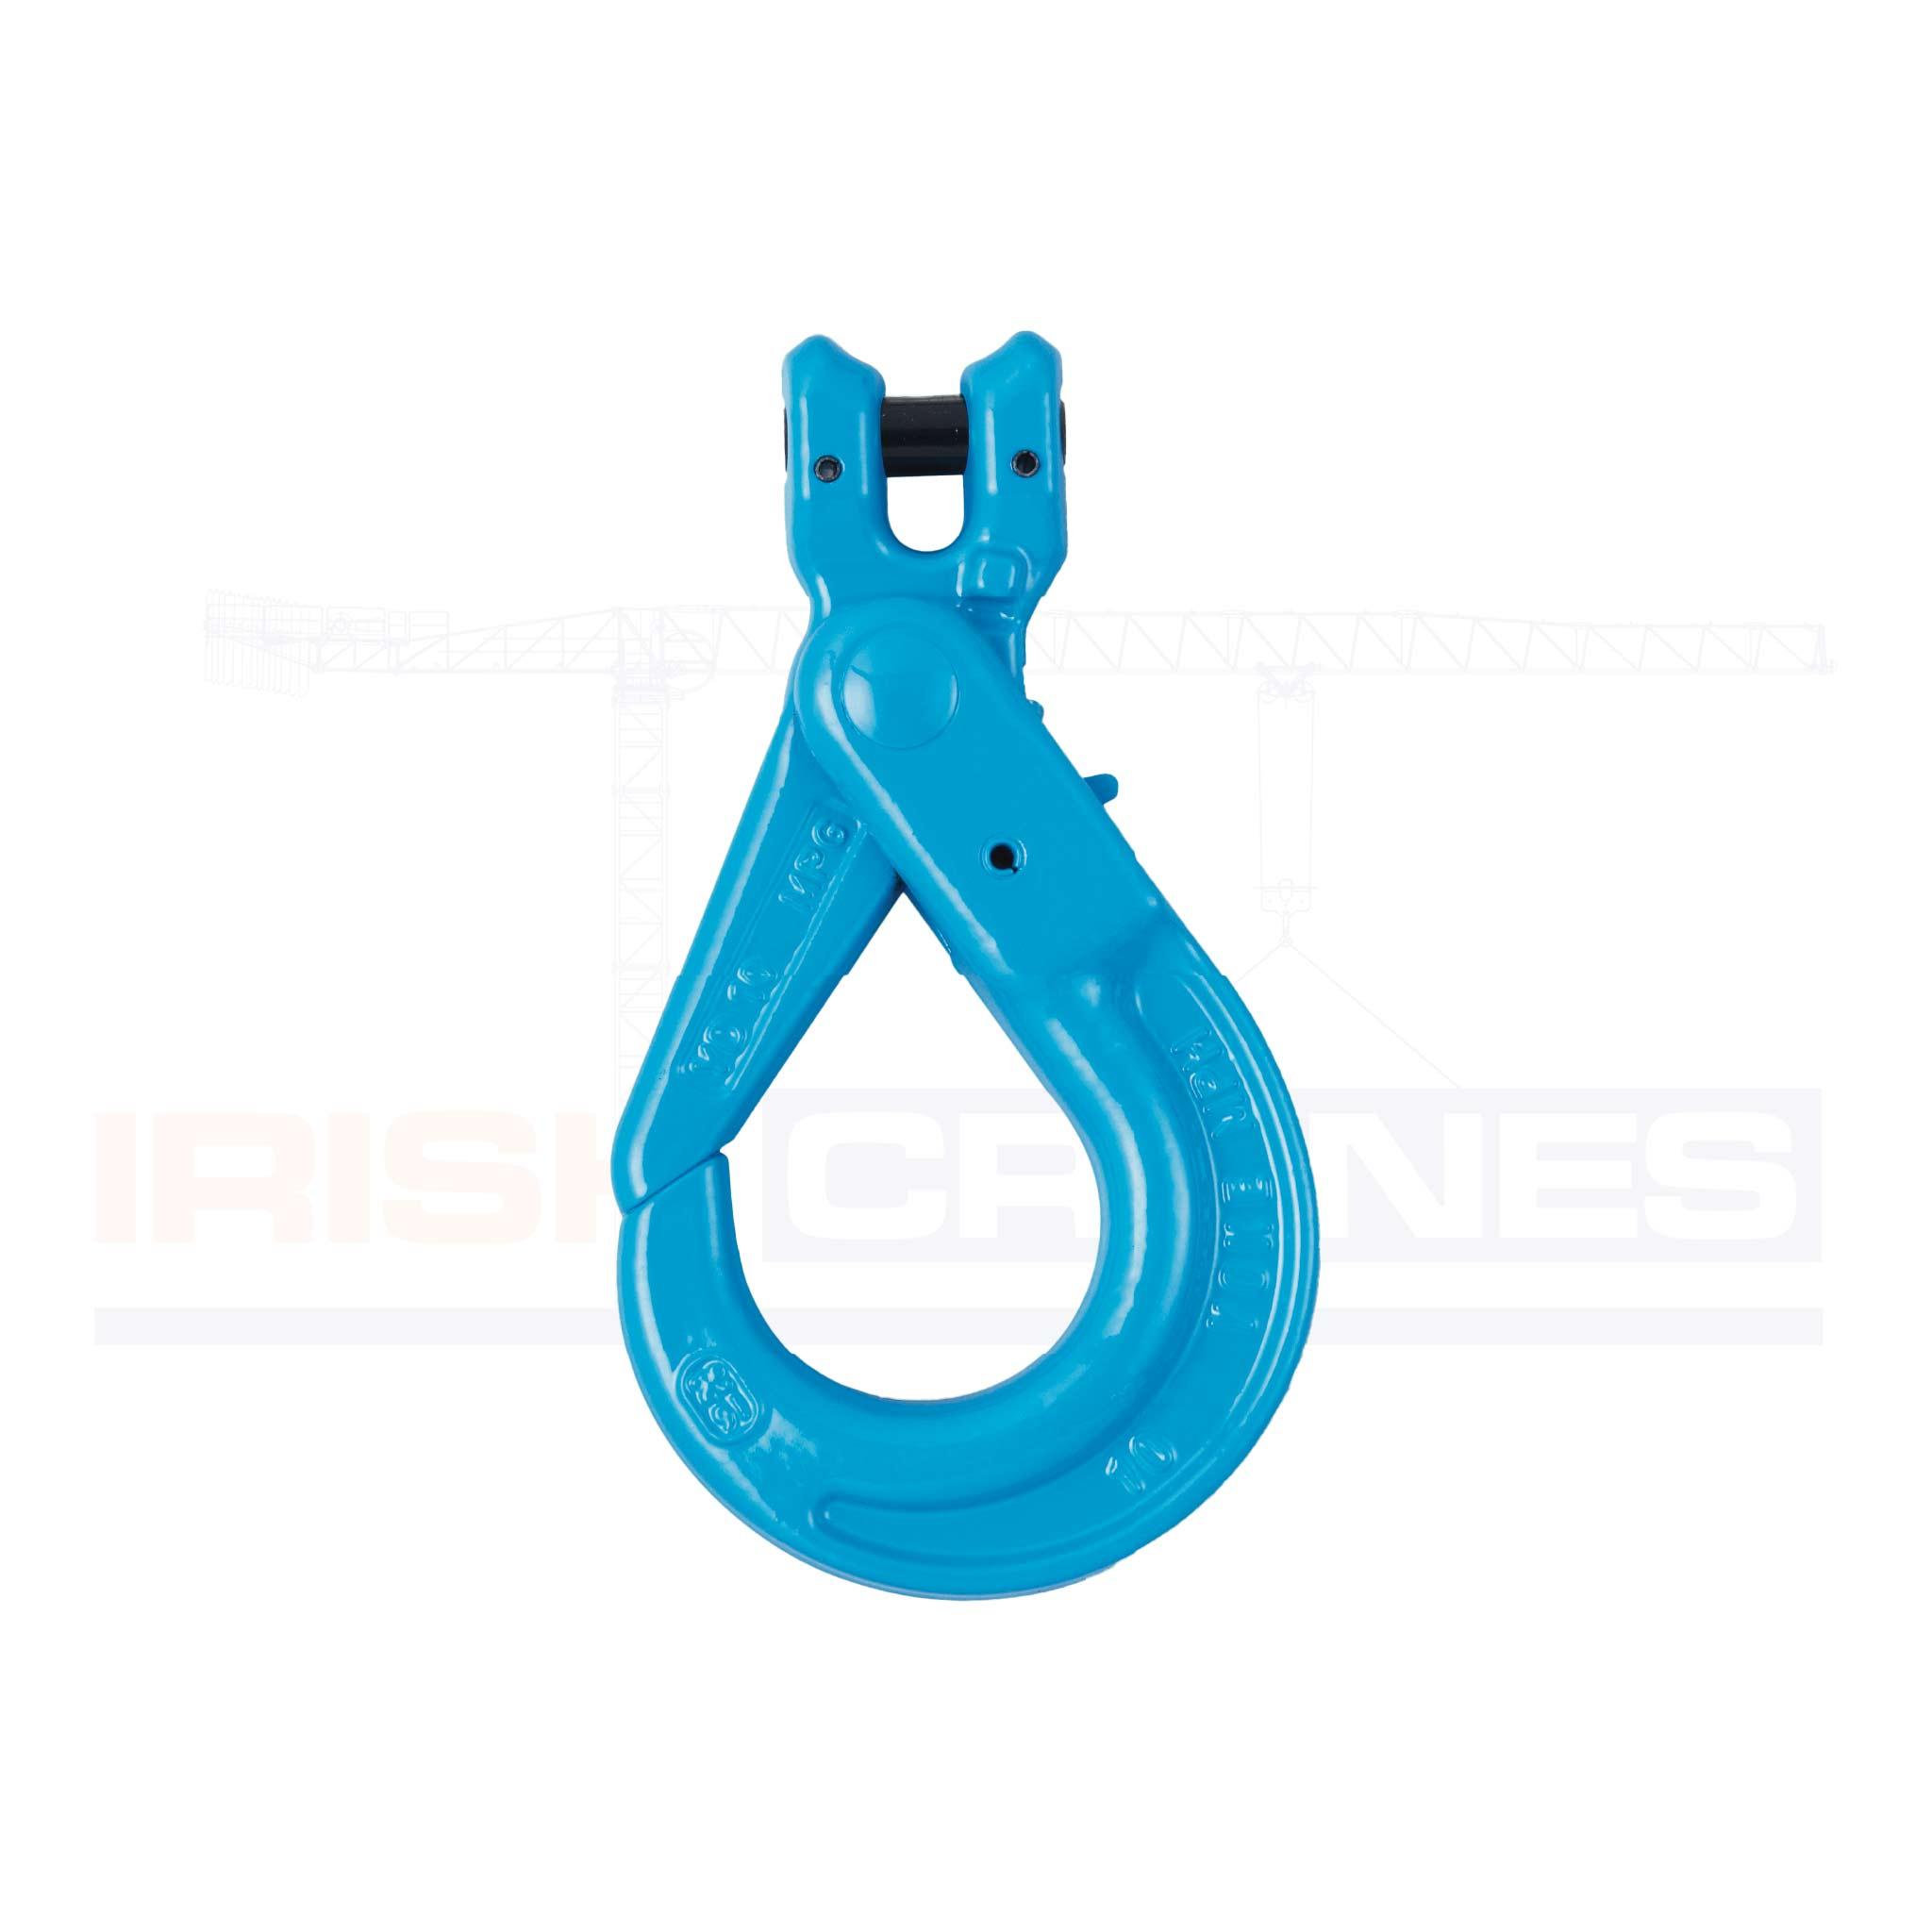 Clevis Self Locking Hooks